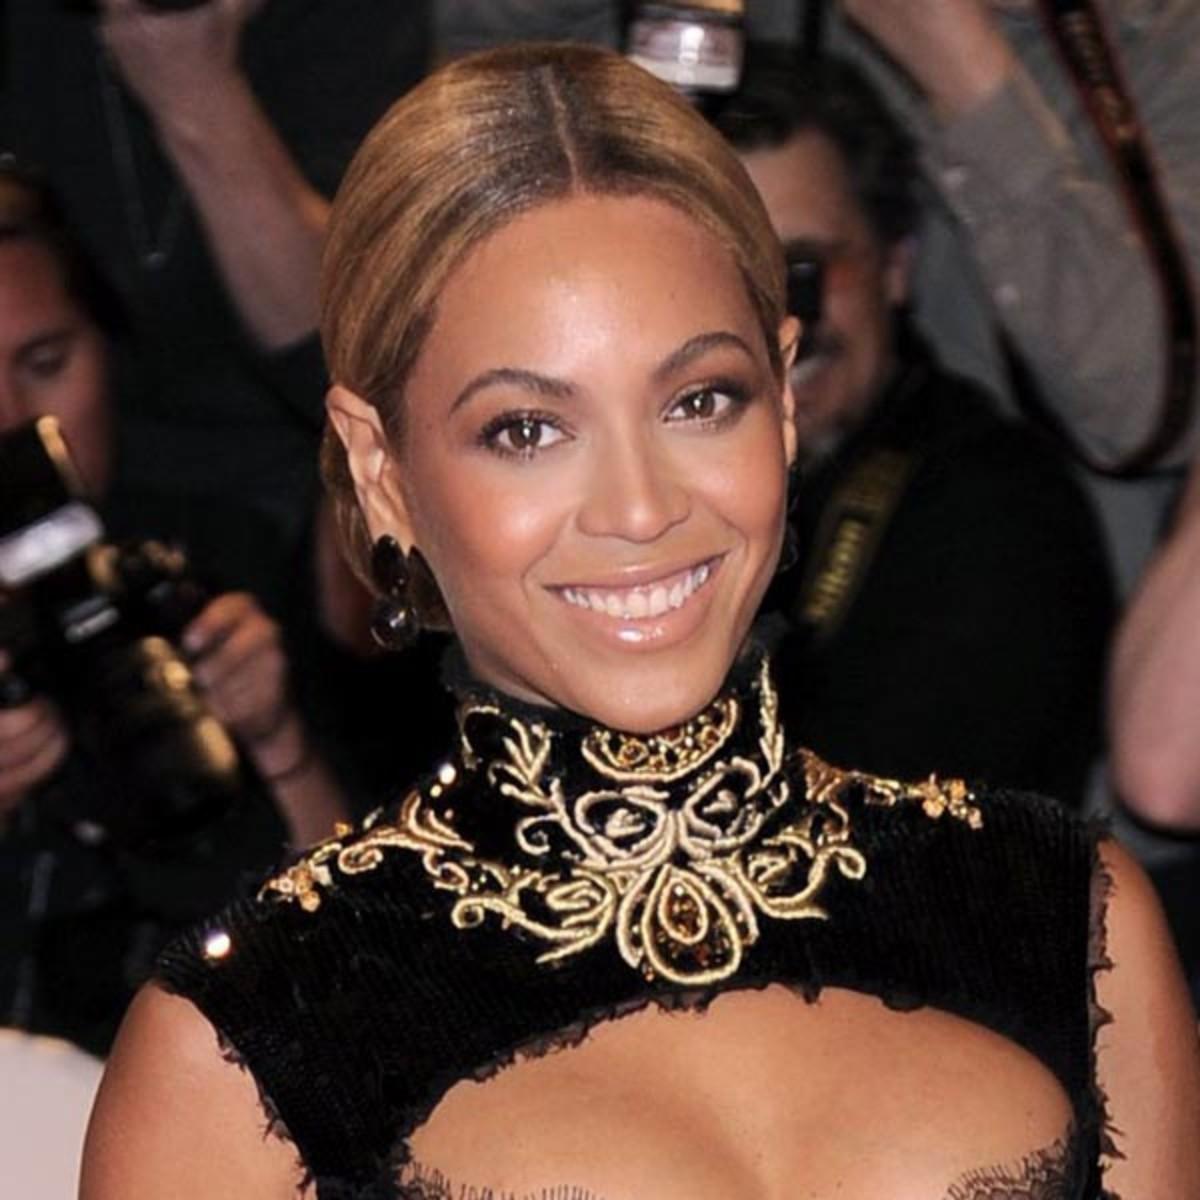 Met-Ball-2011-Beyonce